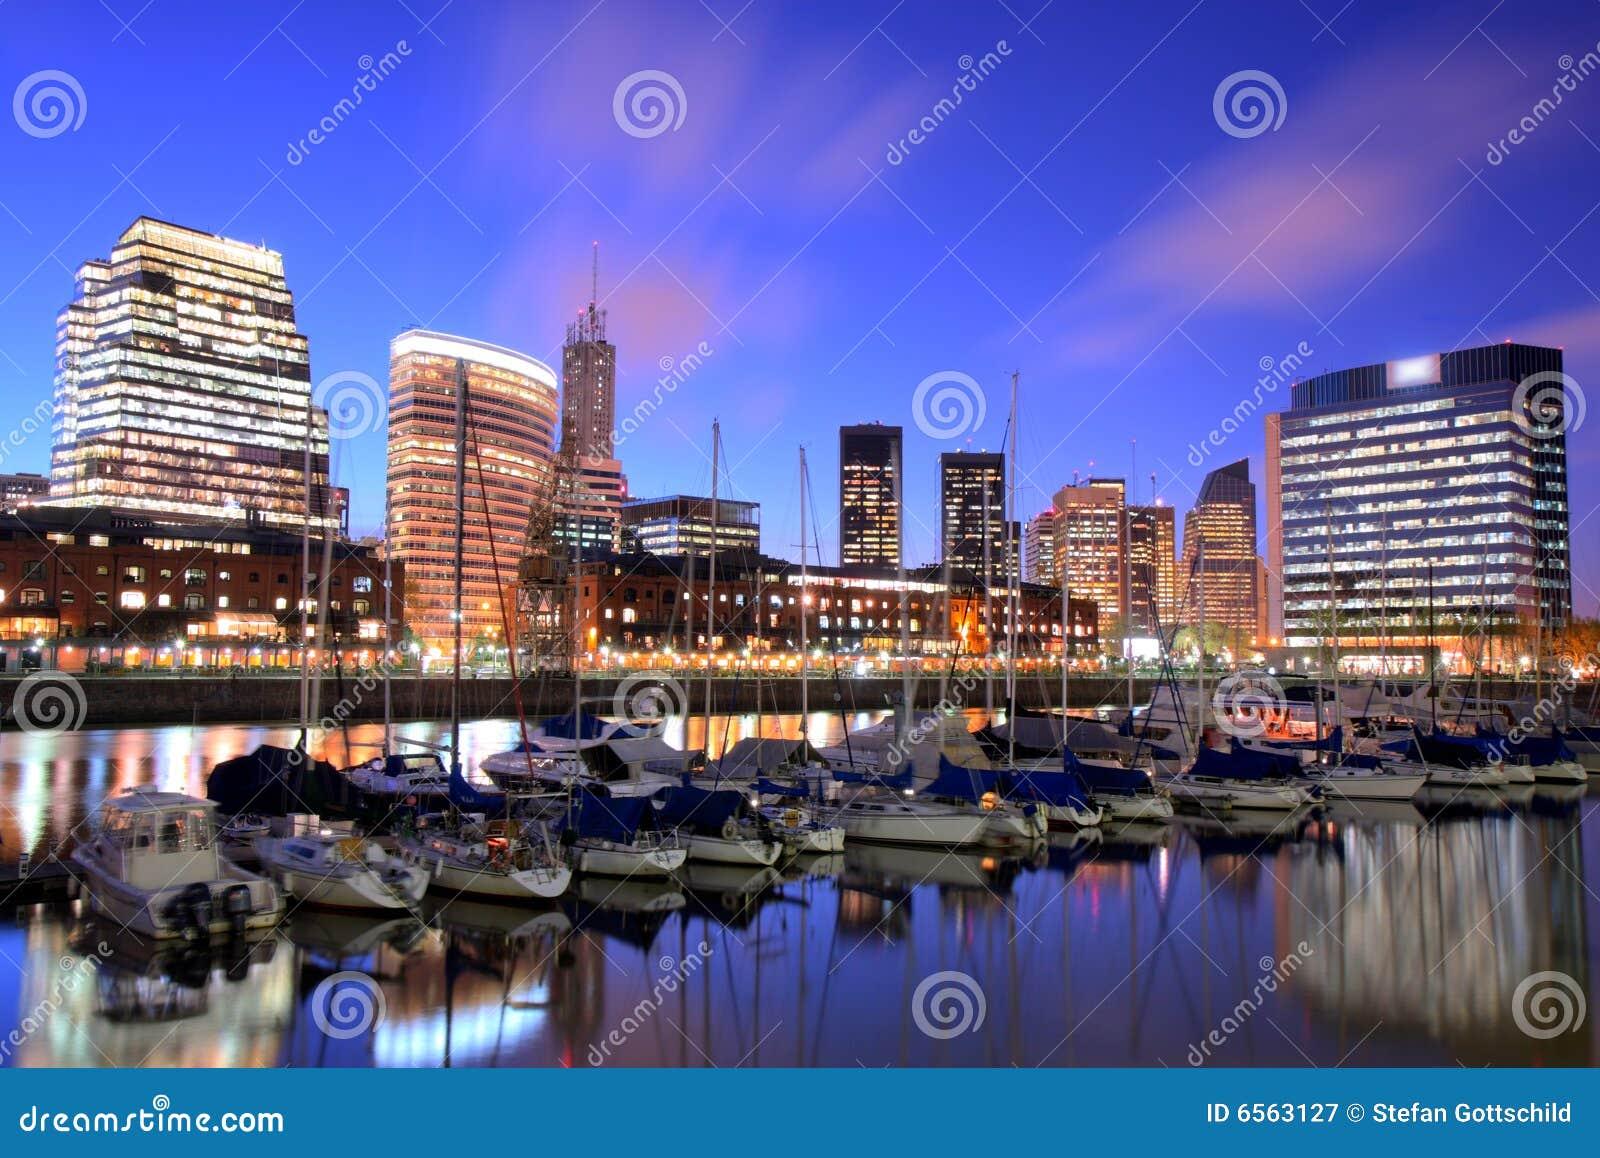 Aires buenos都市风景